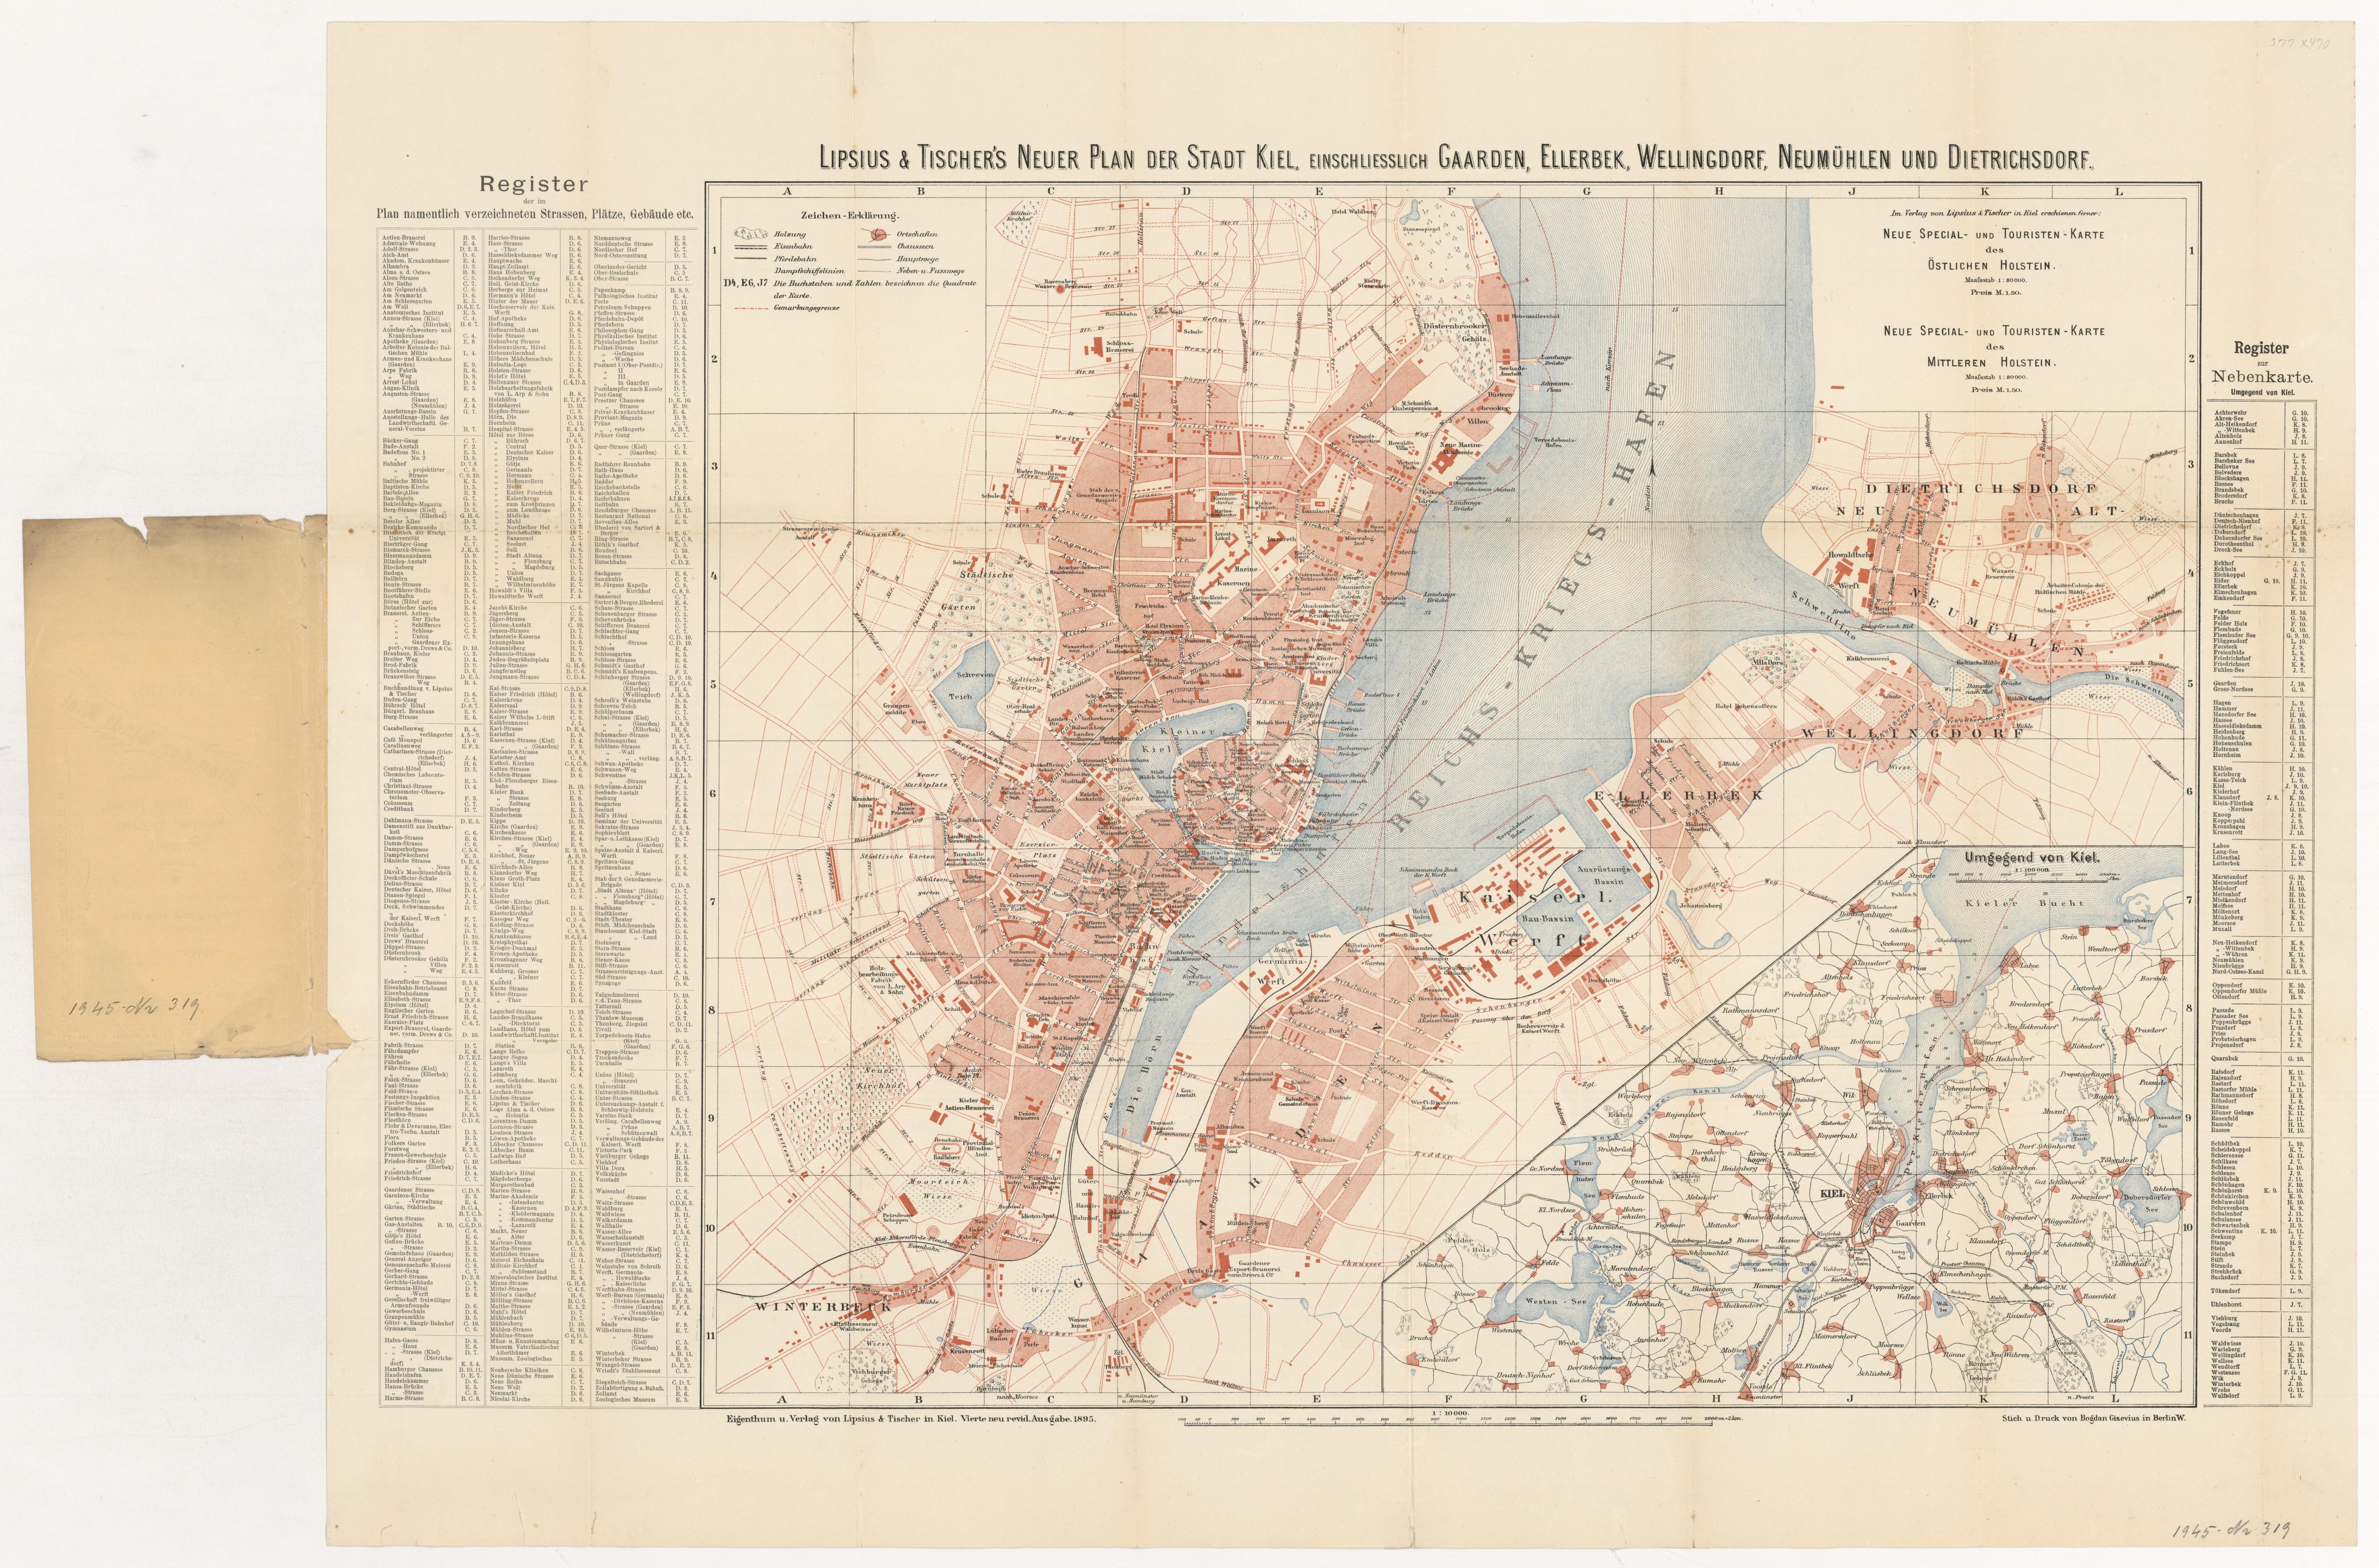 File Lipsius Tischer S Karte 1895 Dk008104 Jpg Wikimedia